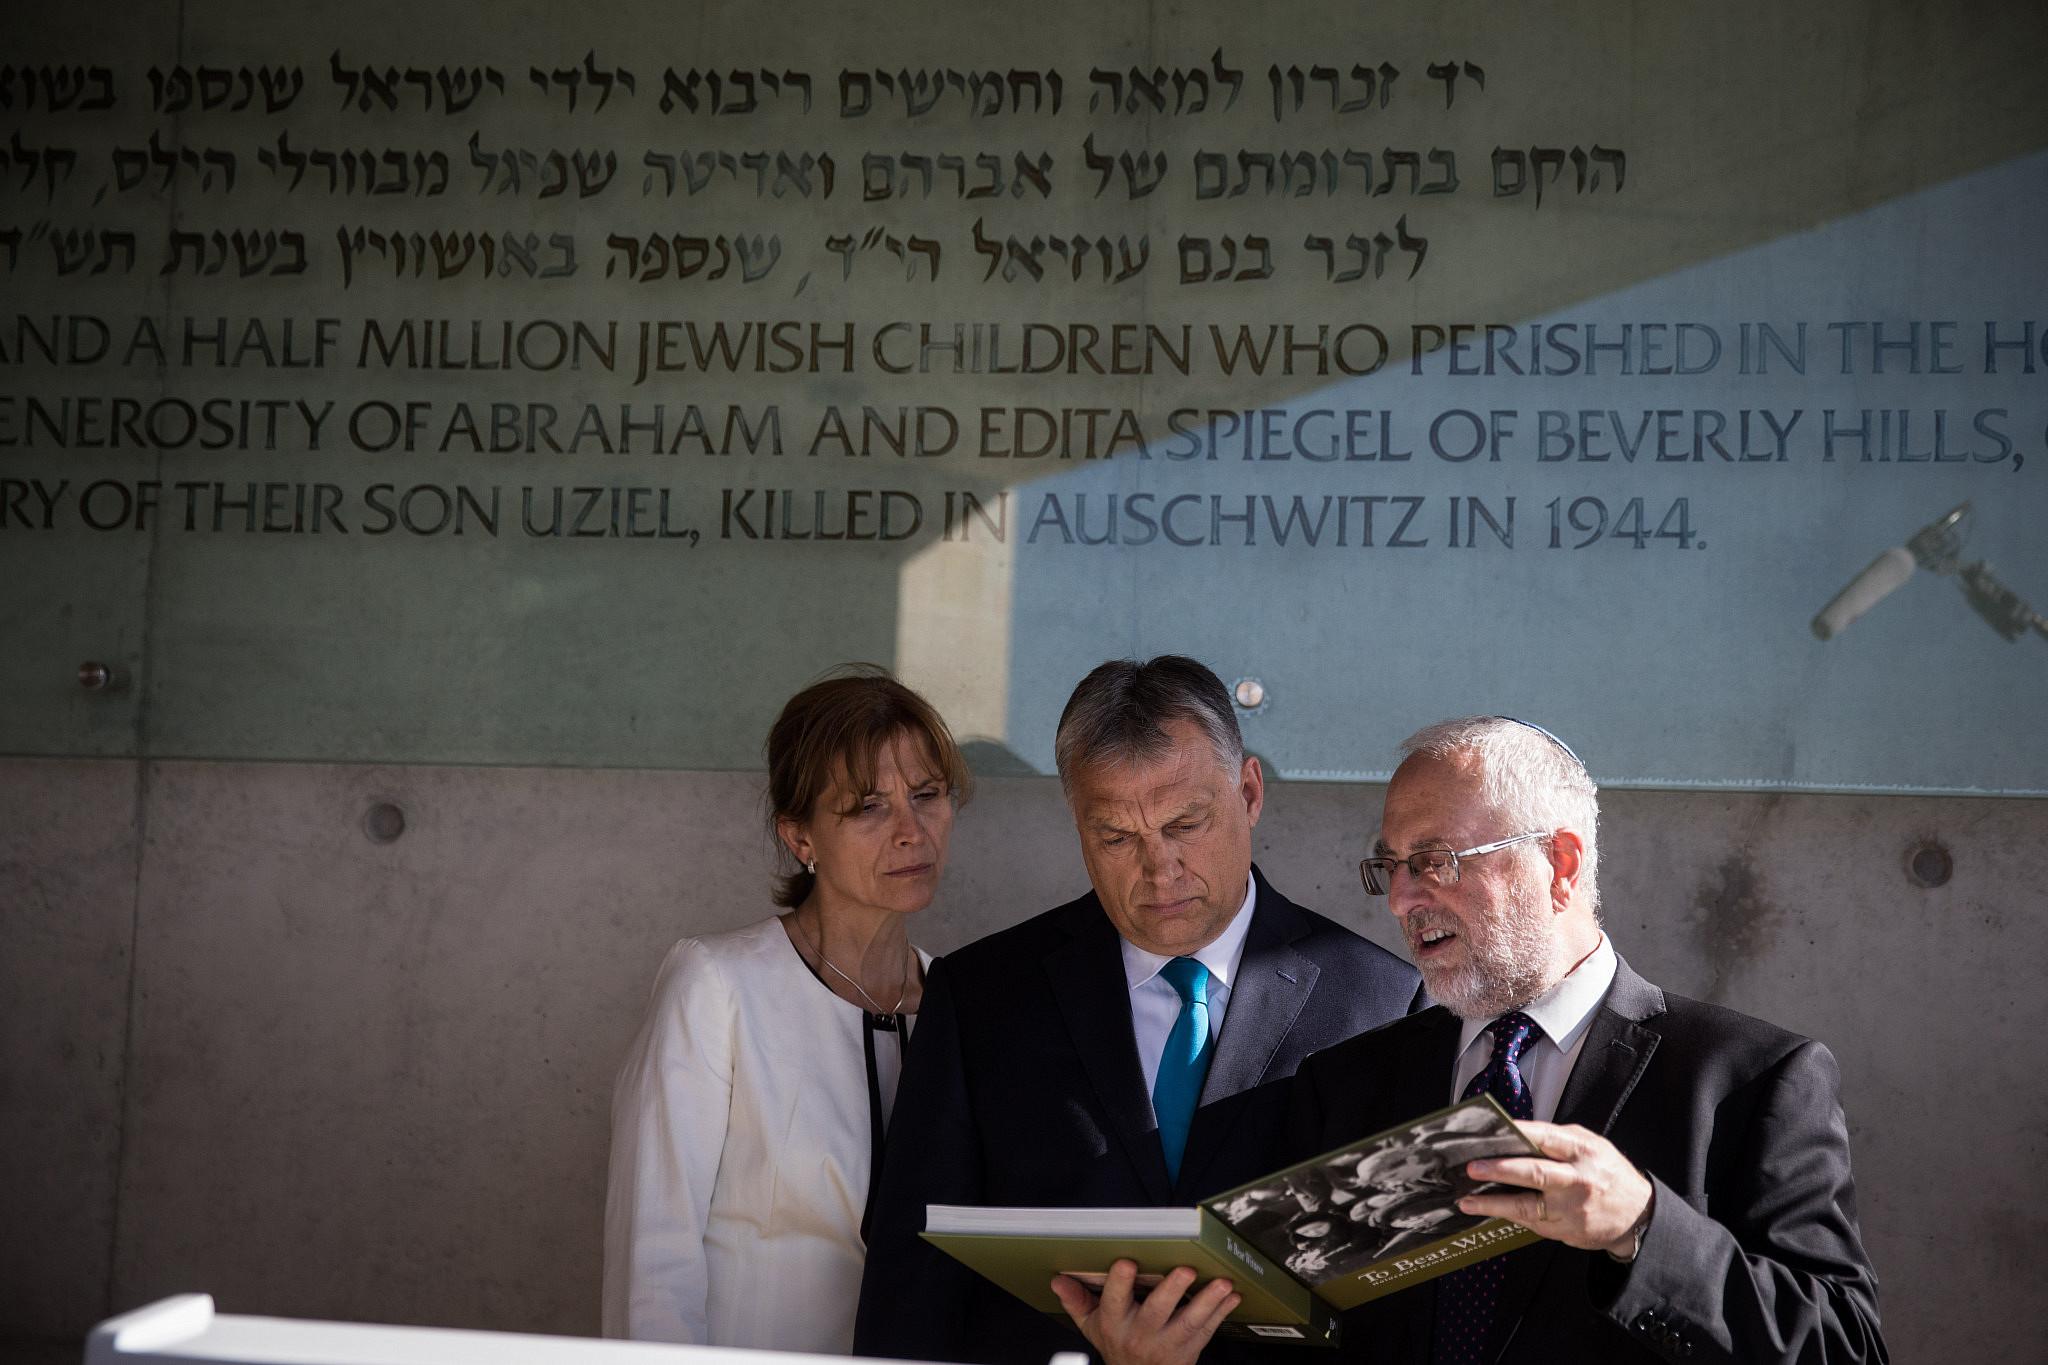 Hungarian Prime Minister Viktor Orbán tours the Yad Vashem Holocaust Memorial Museum, Jerusalem, July 19, 2018. (Hadas Parush/Flash90)